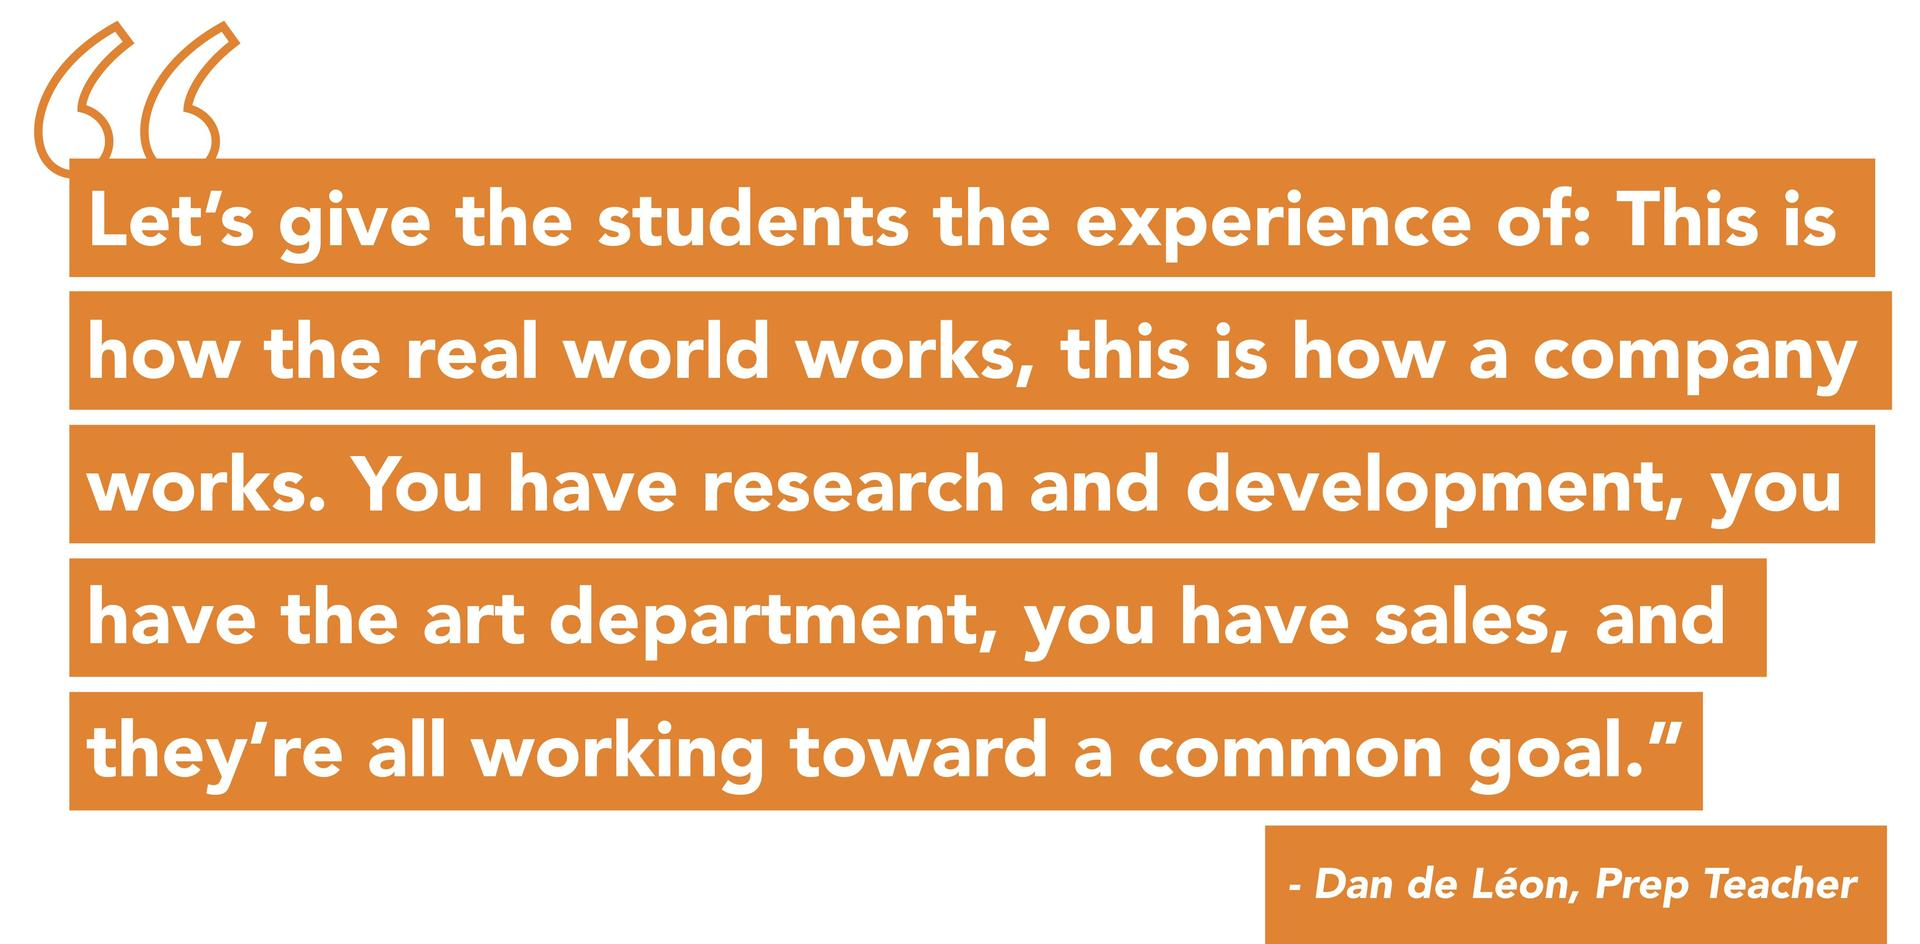 Quote from Entrepreneurial Studies Teacher